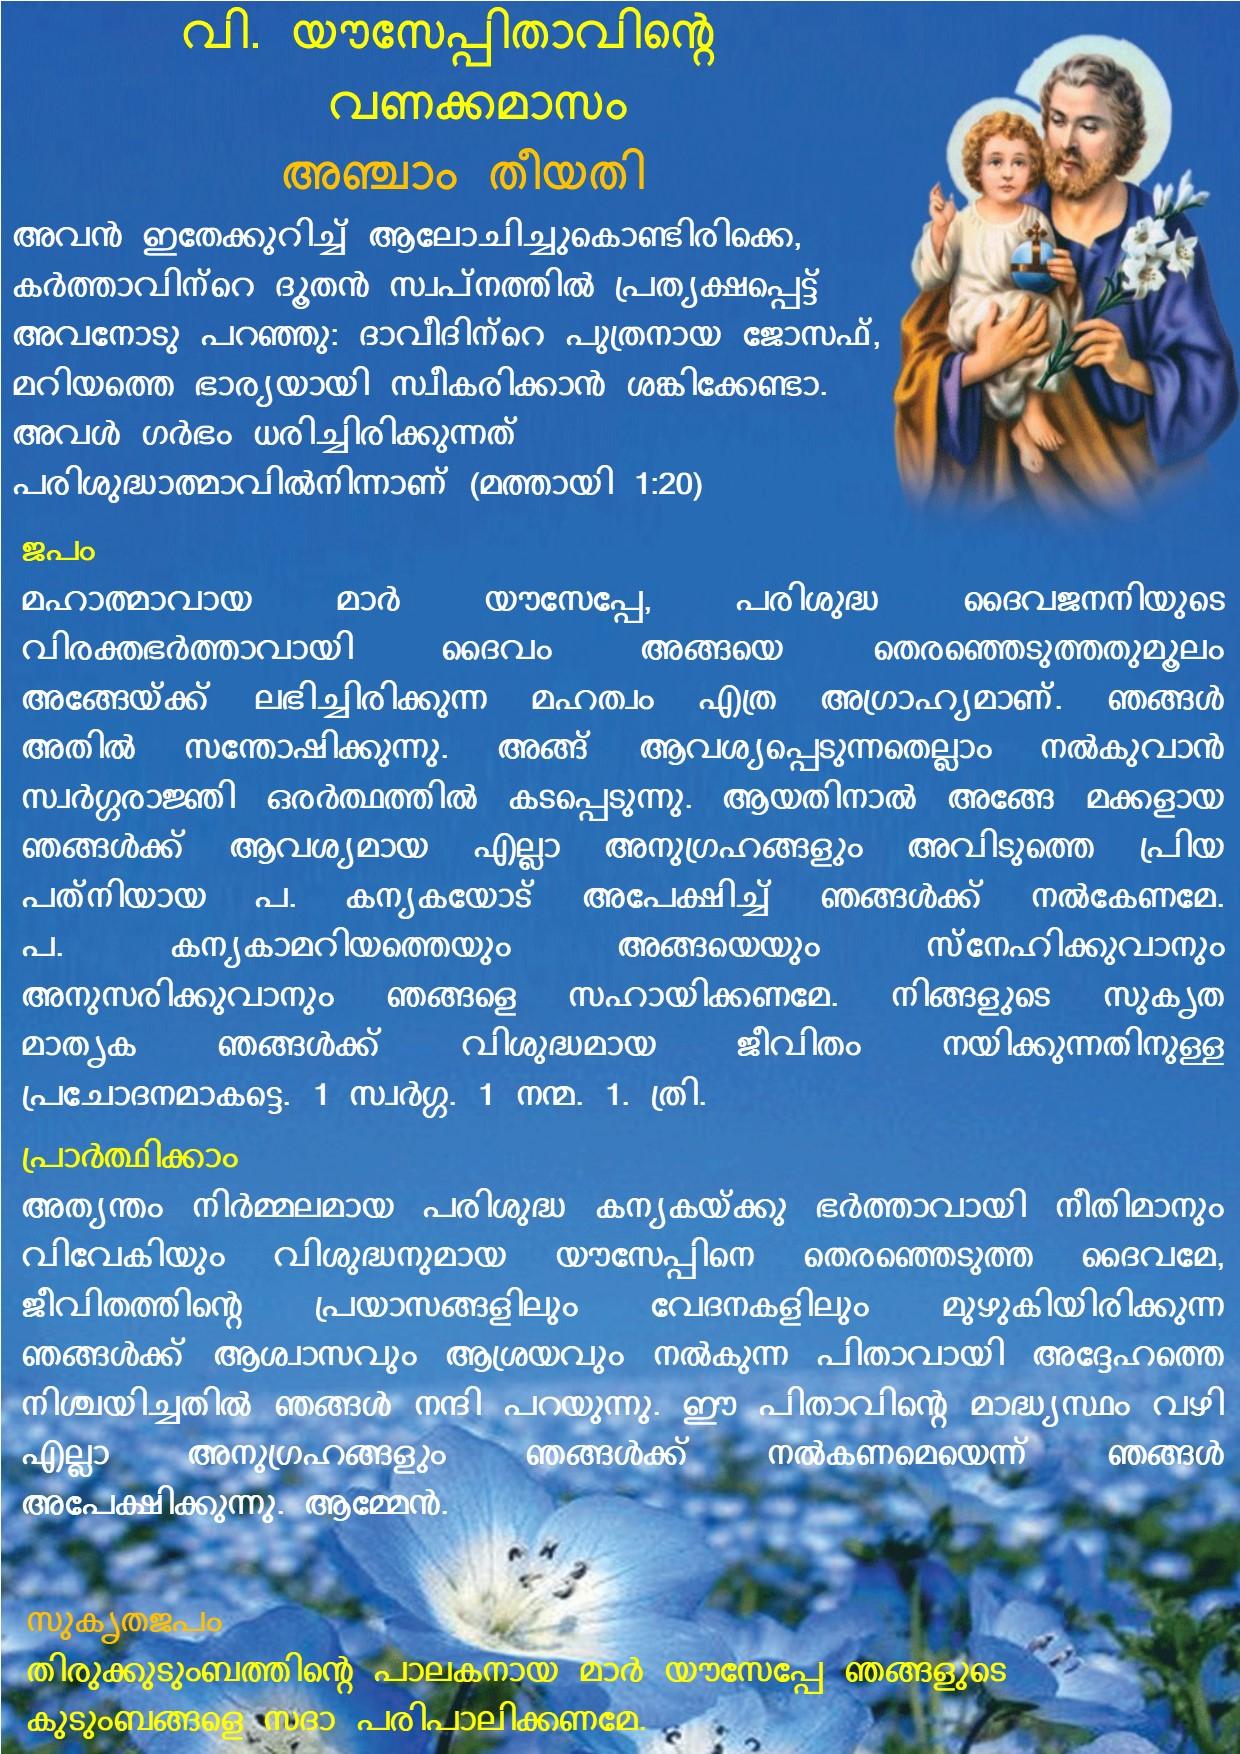 Vanakkamasam, St Joseph, March 05